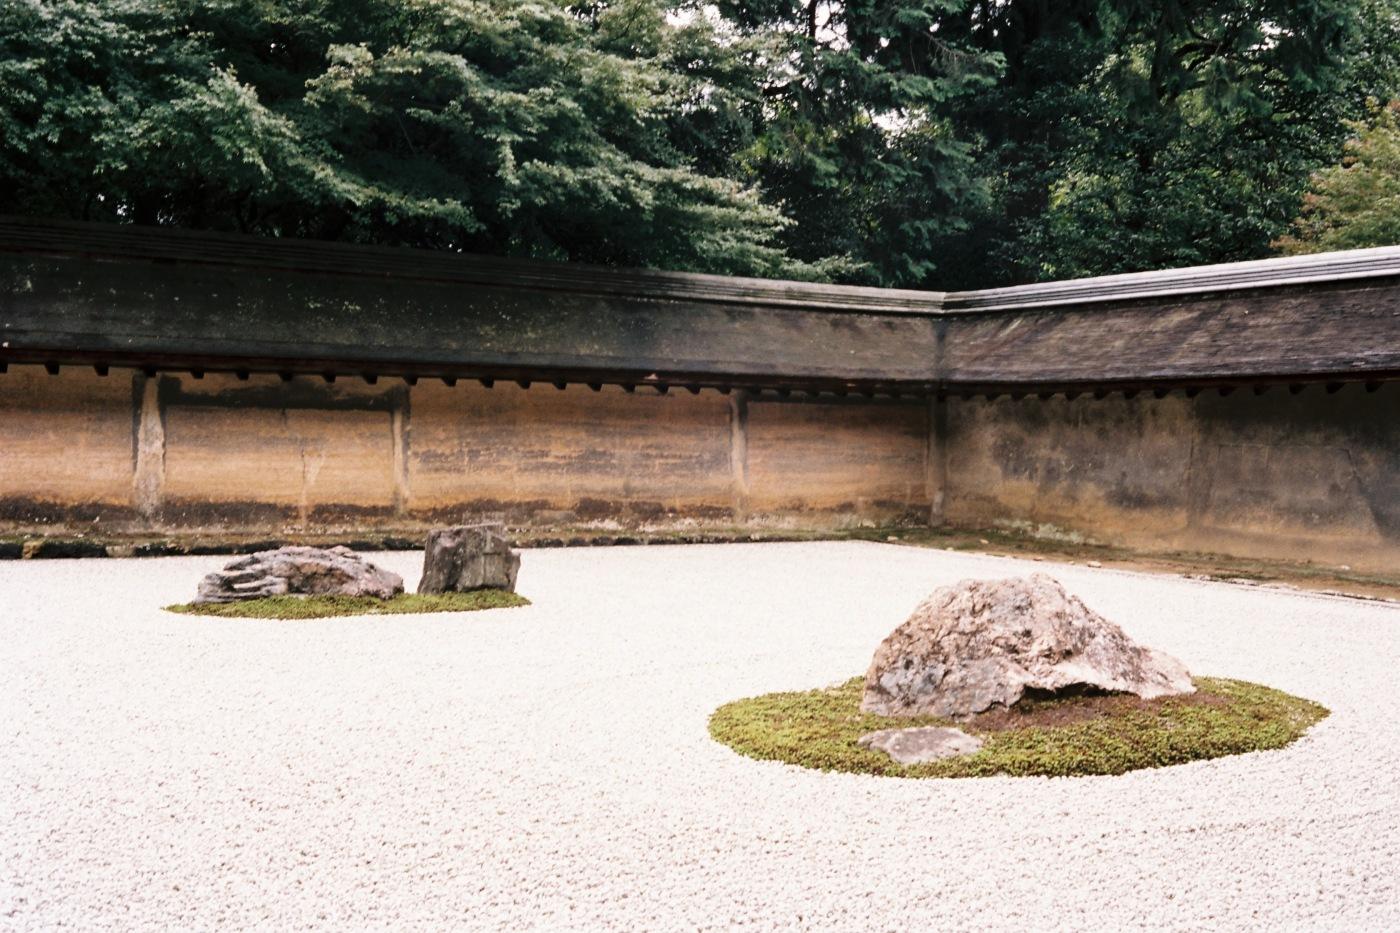 Garden at Ryoan-ji temple - Portra 160